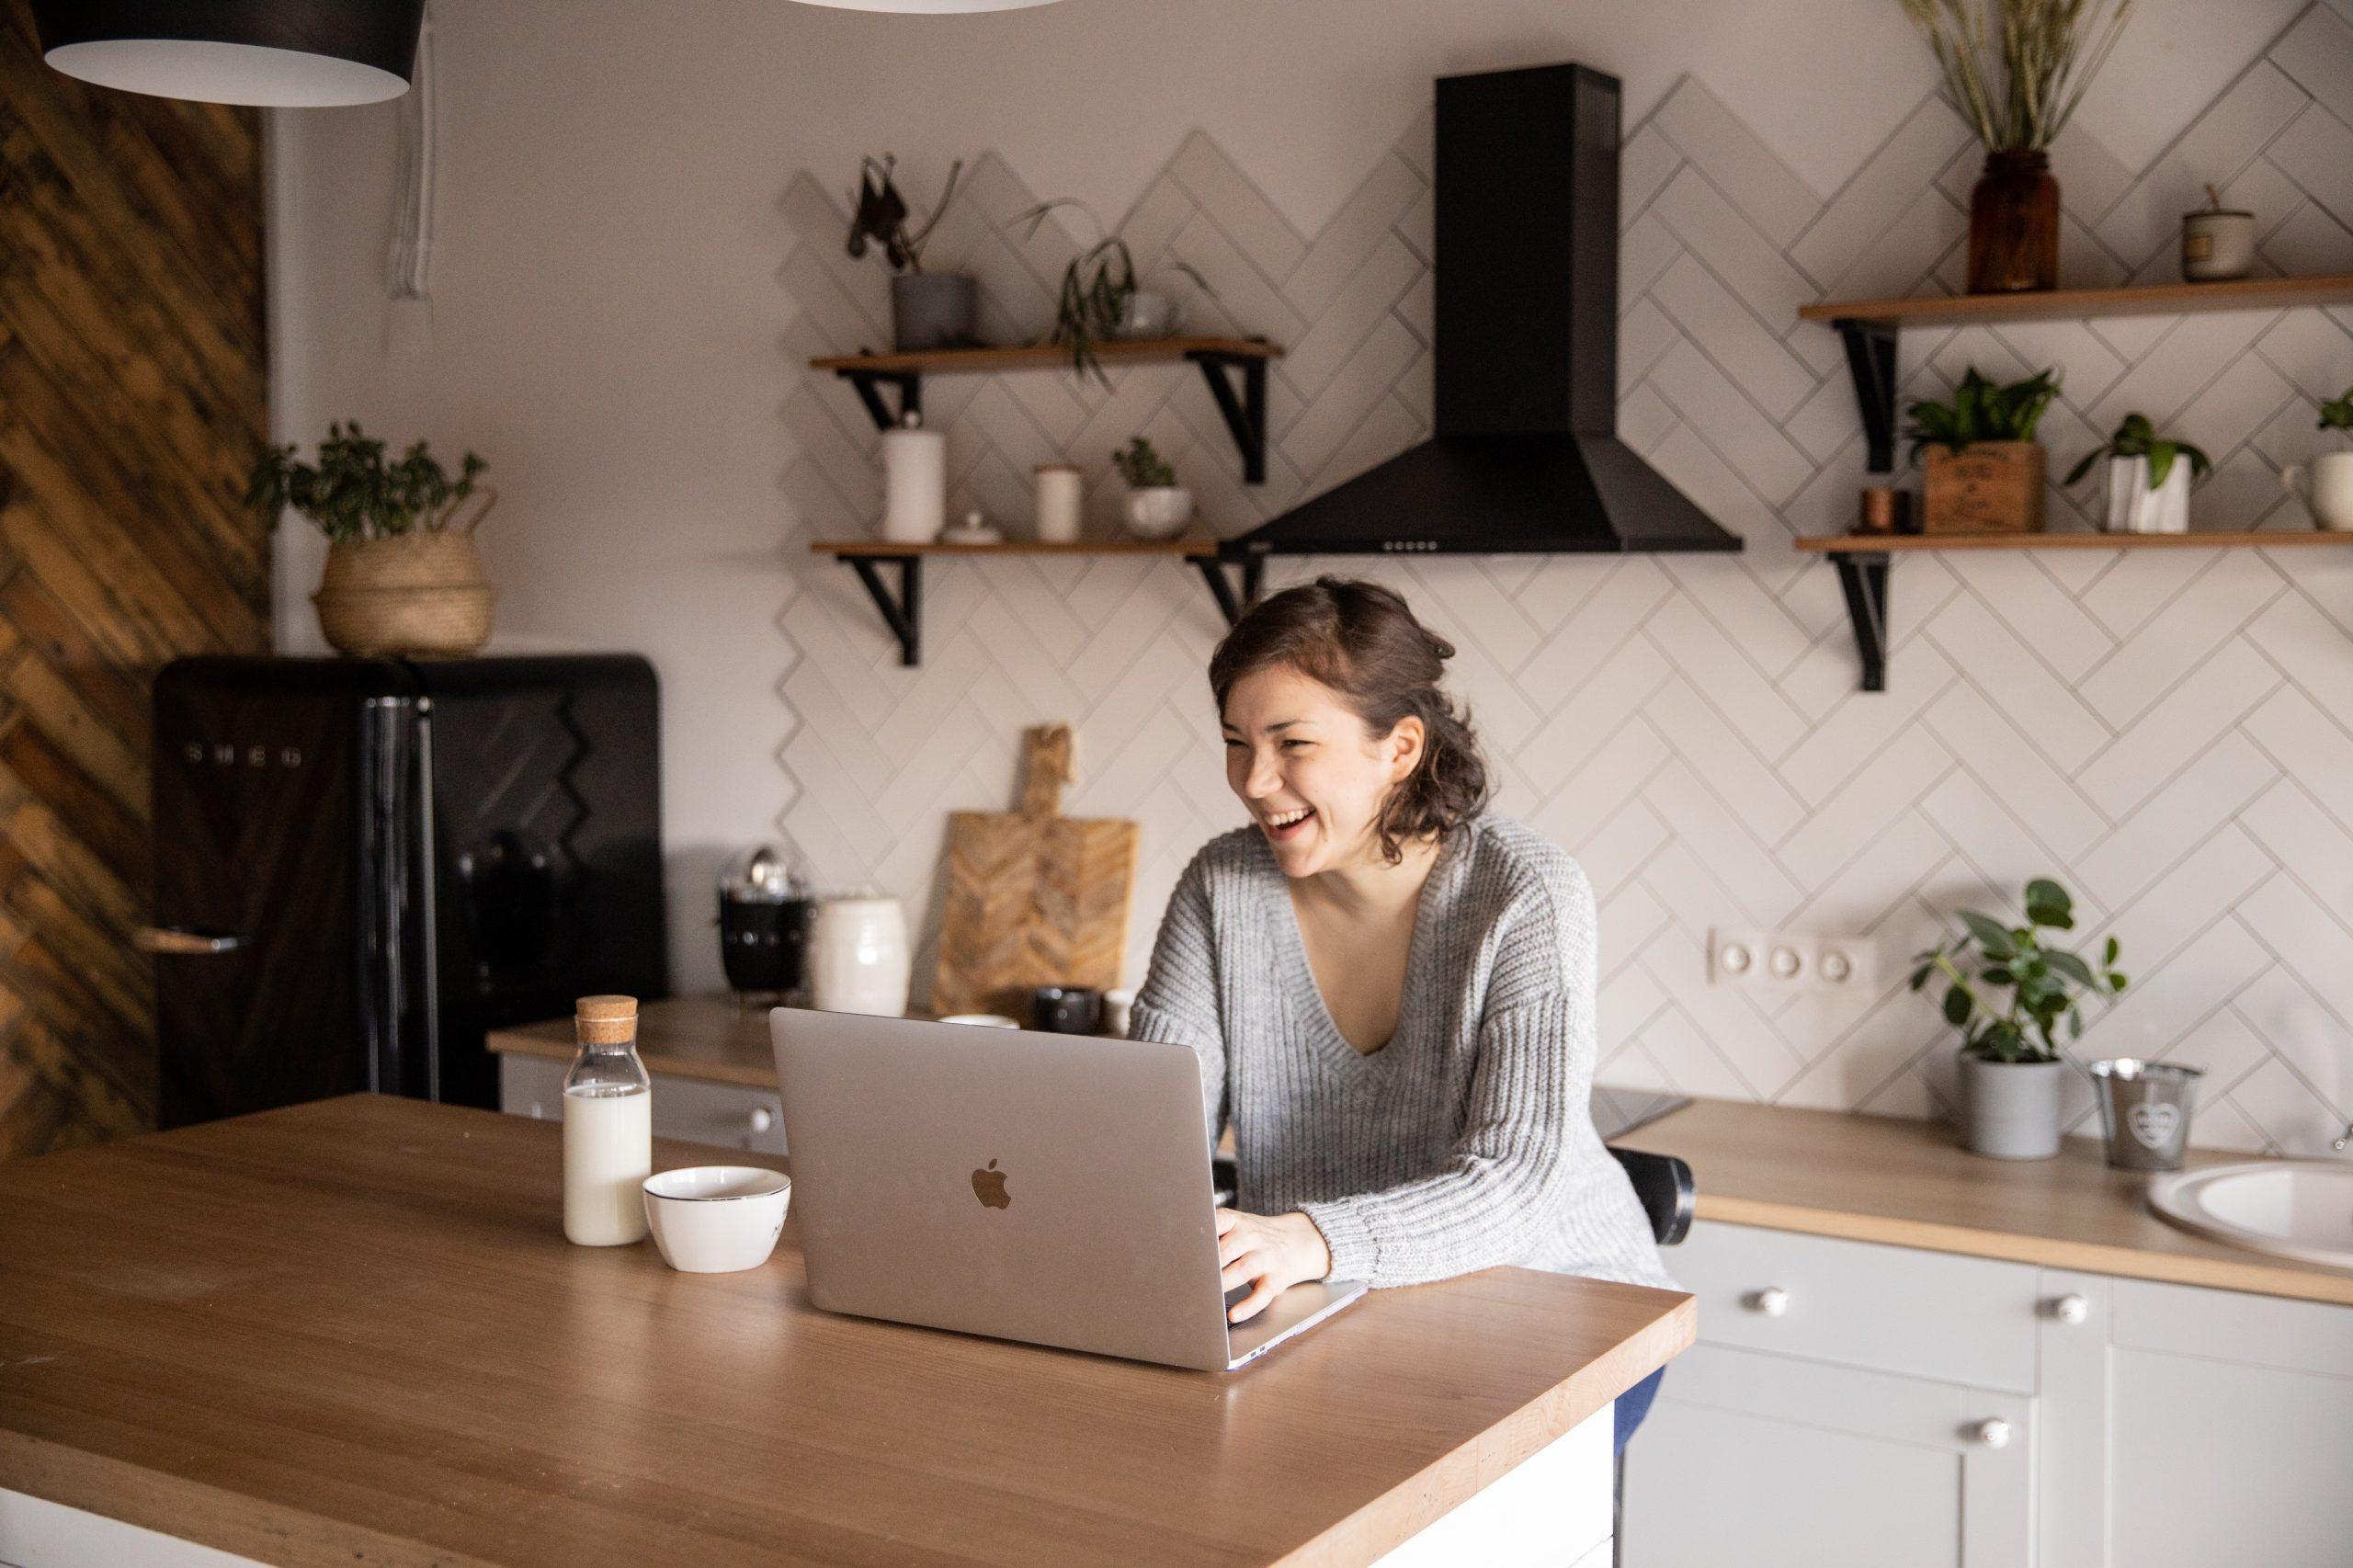 Converting A Subscriber Into A Customer